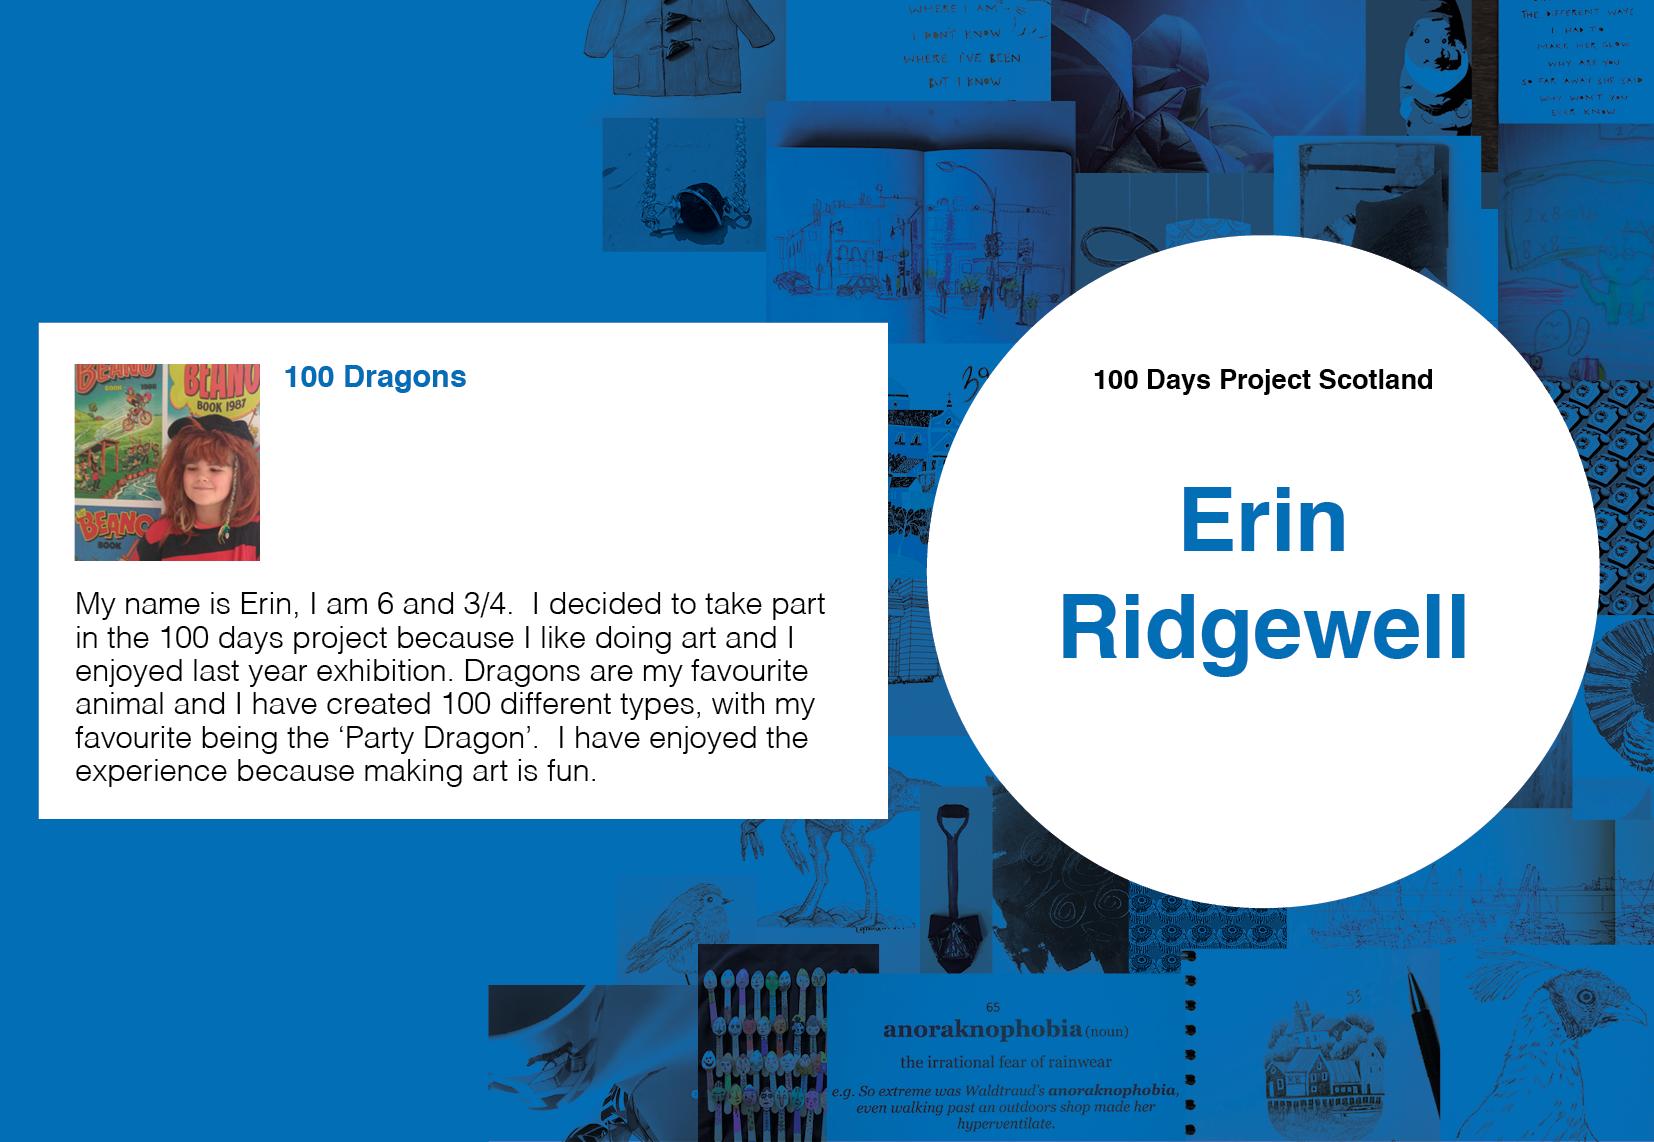 Erin Ridgewell